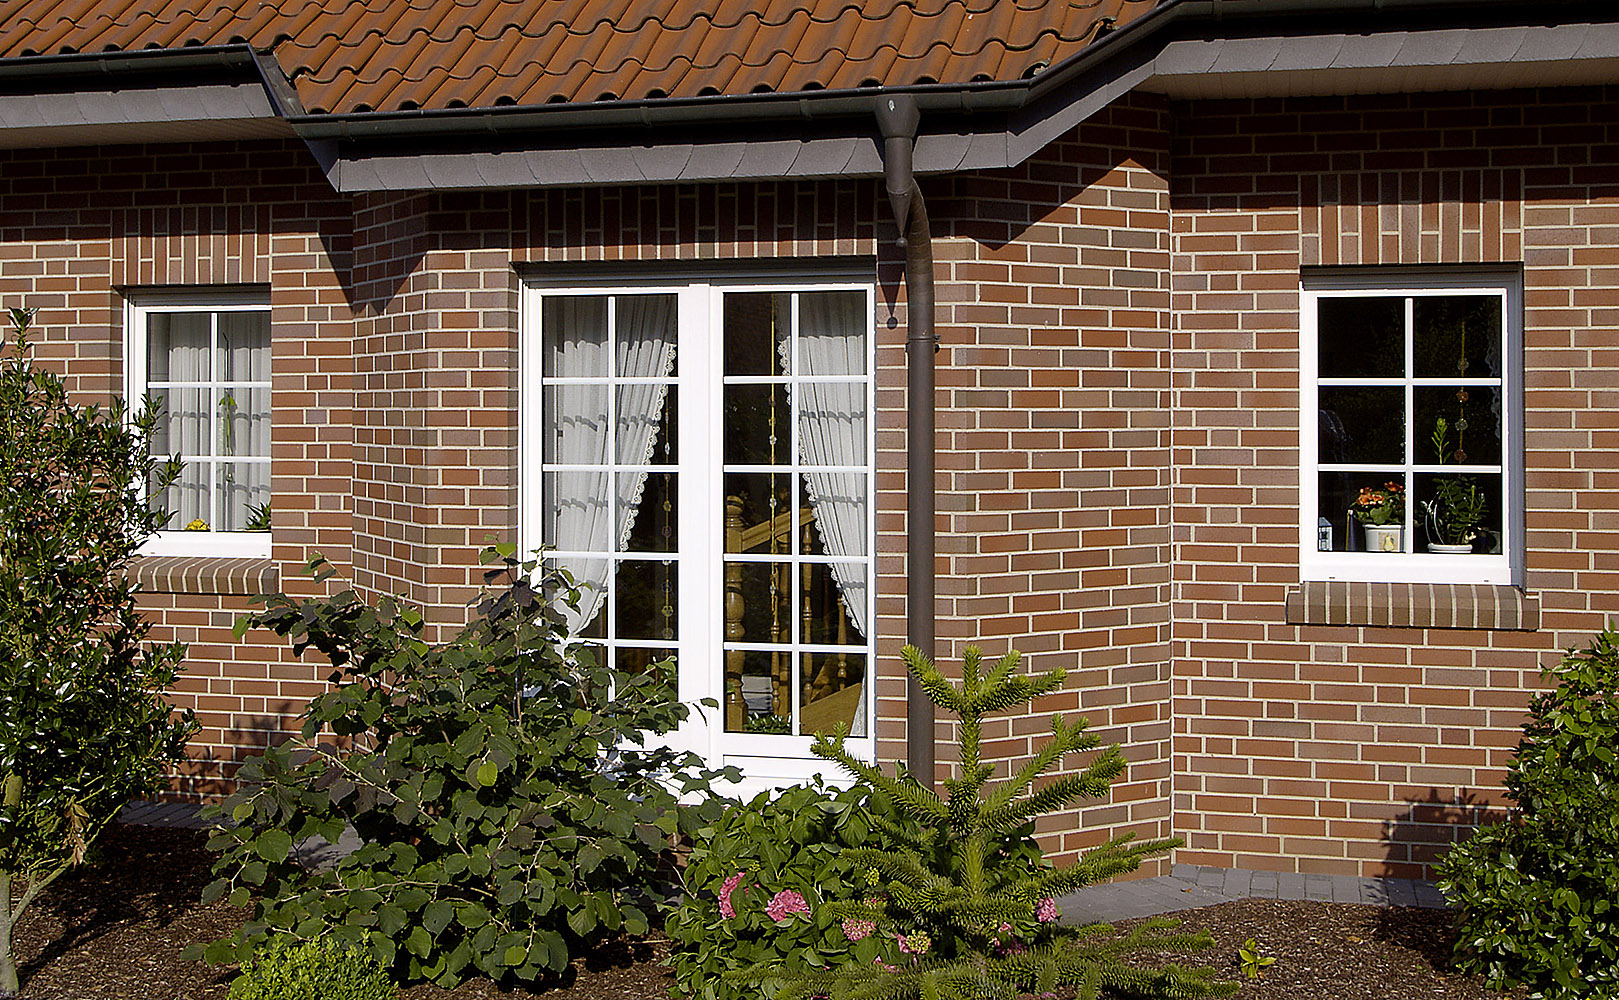 Izdelava oken odpira opeko